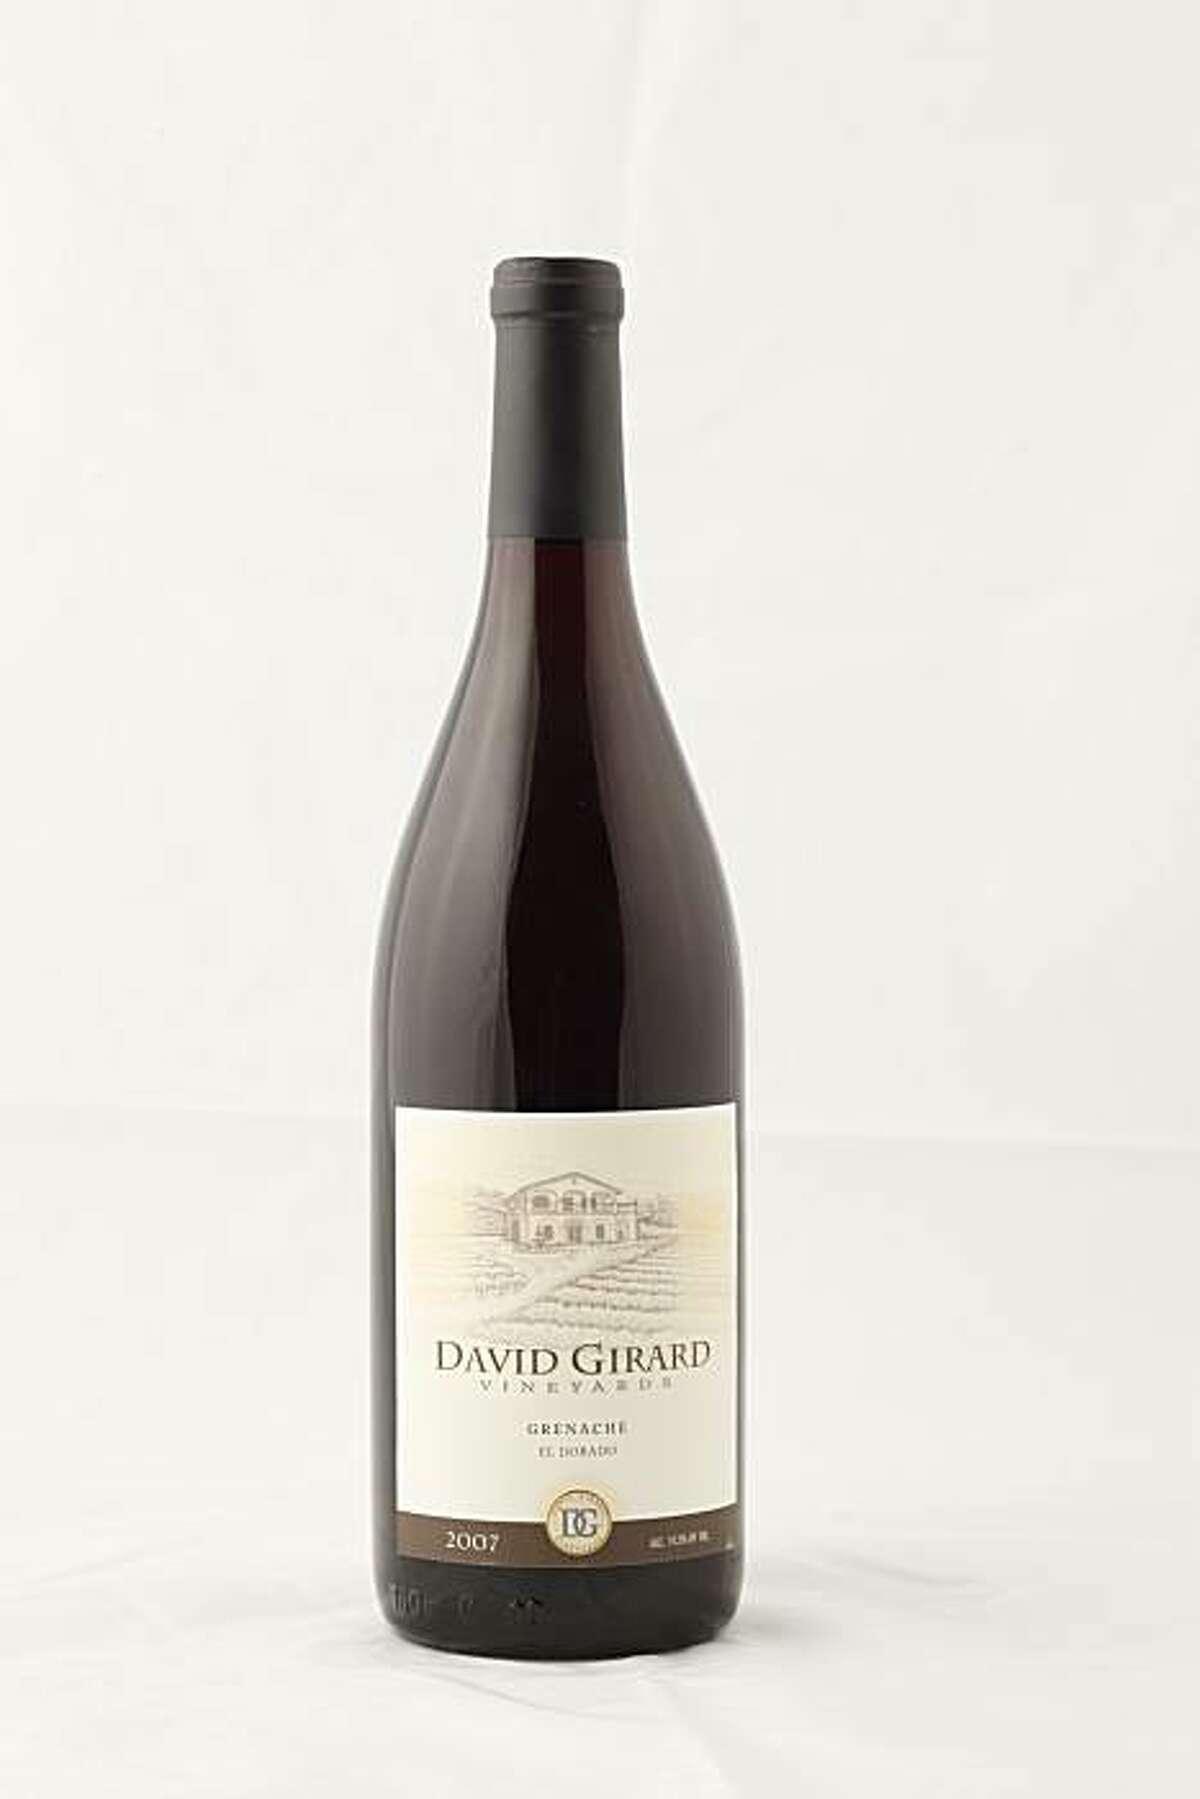 2007 David Girard Vineyards Grenache El Dorado in San Francisco, Calif., on March 10, 2010.